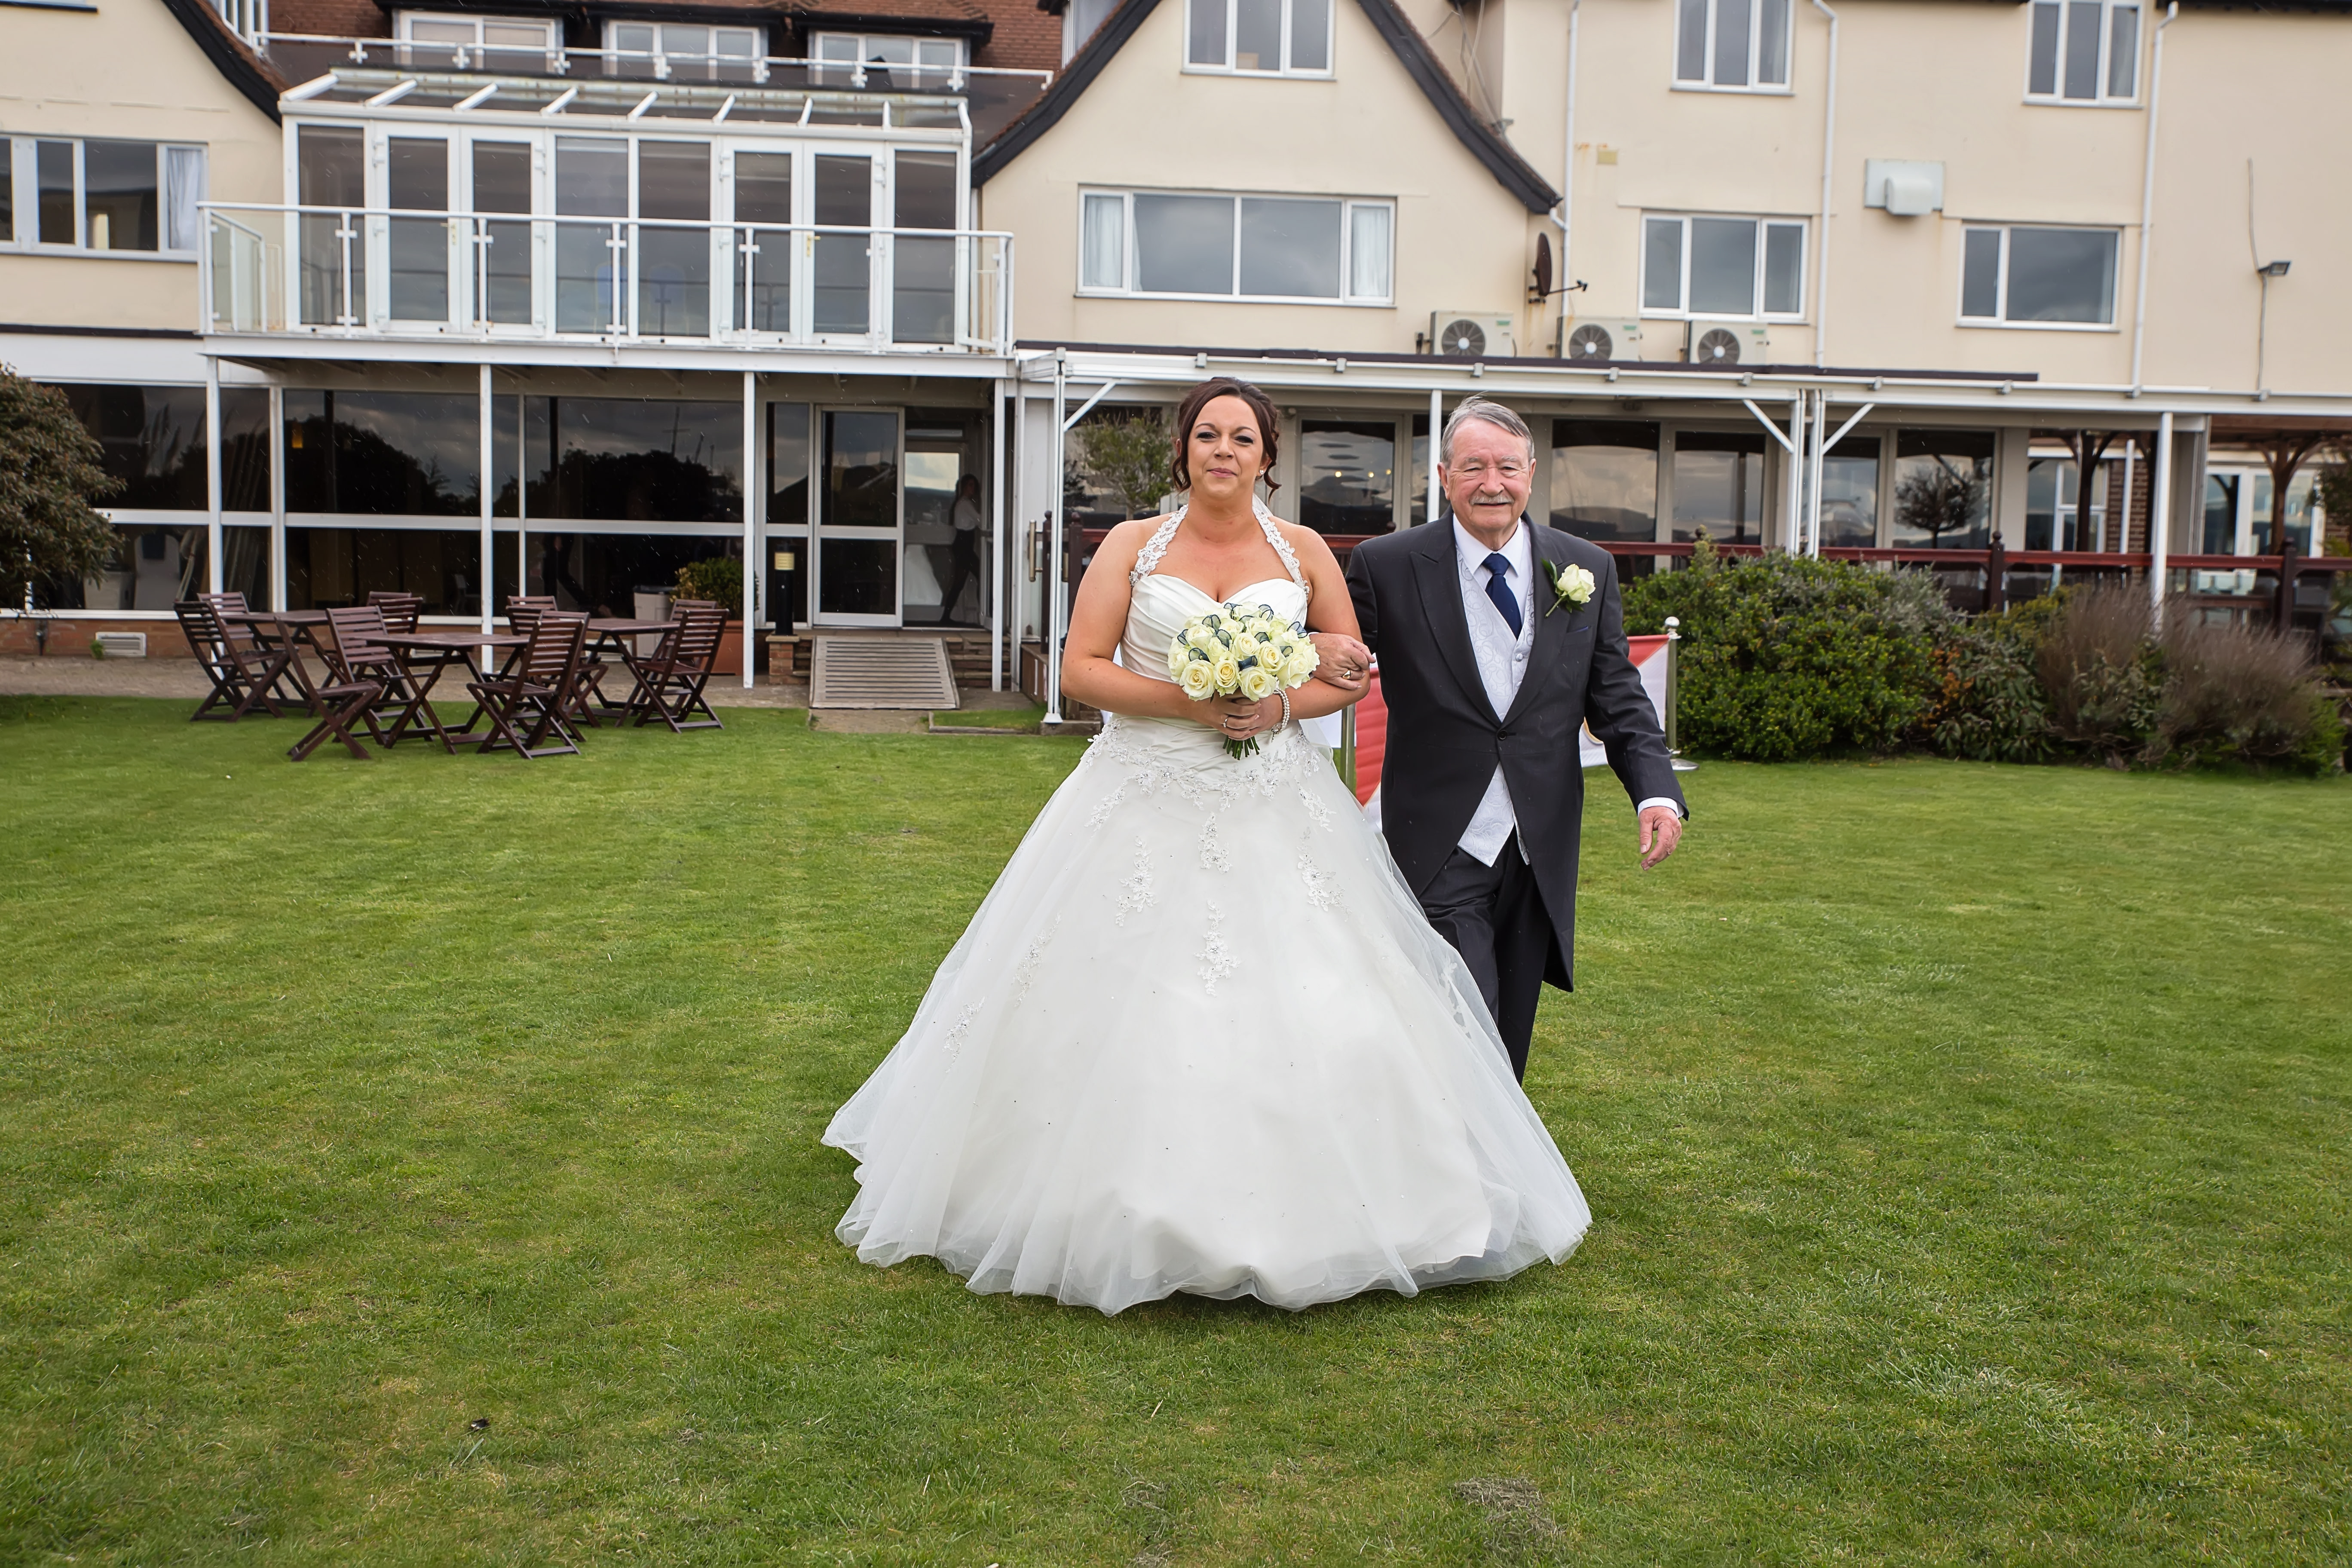 South West   Dorset   Poole   Spring   Coastal   Classic   Navy   White   Hotel   Real Wedding   Jennie Franklin #Bridebook #RealWedding #WeddingIdeas Bridebook.co.uk